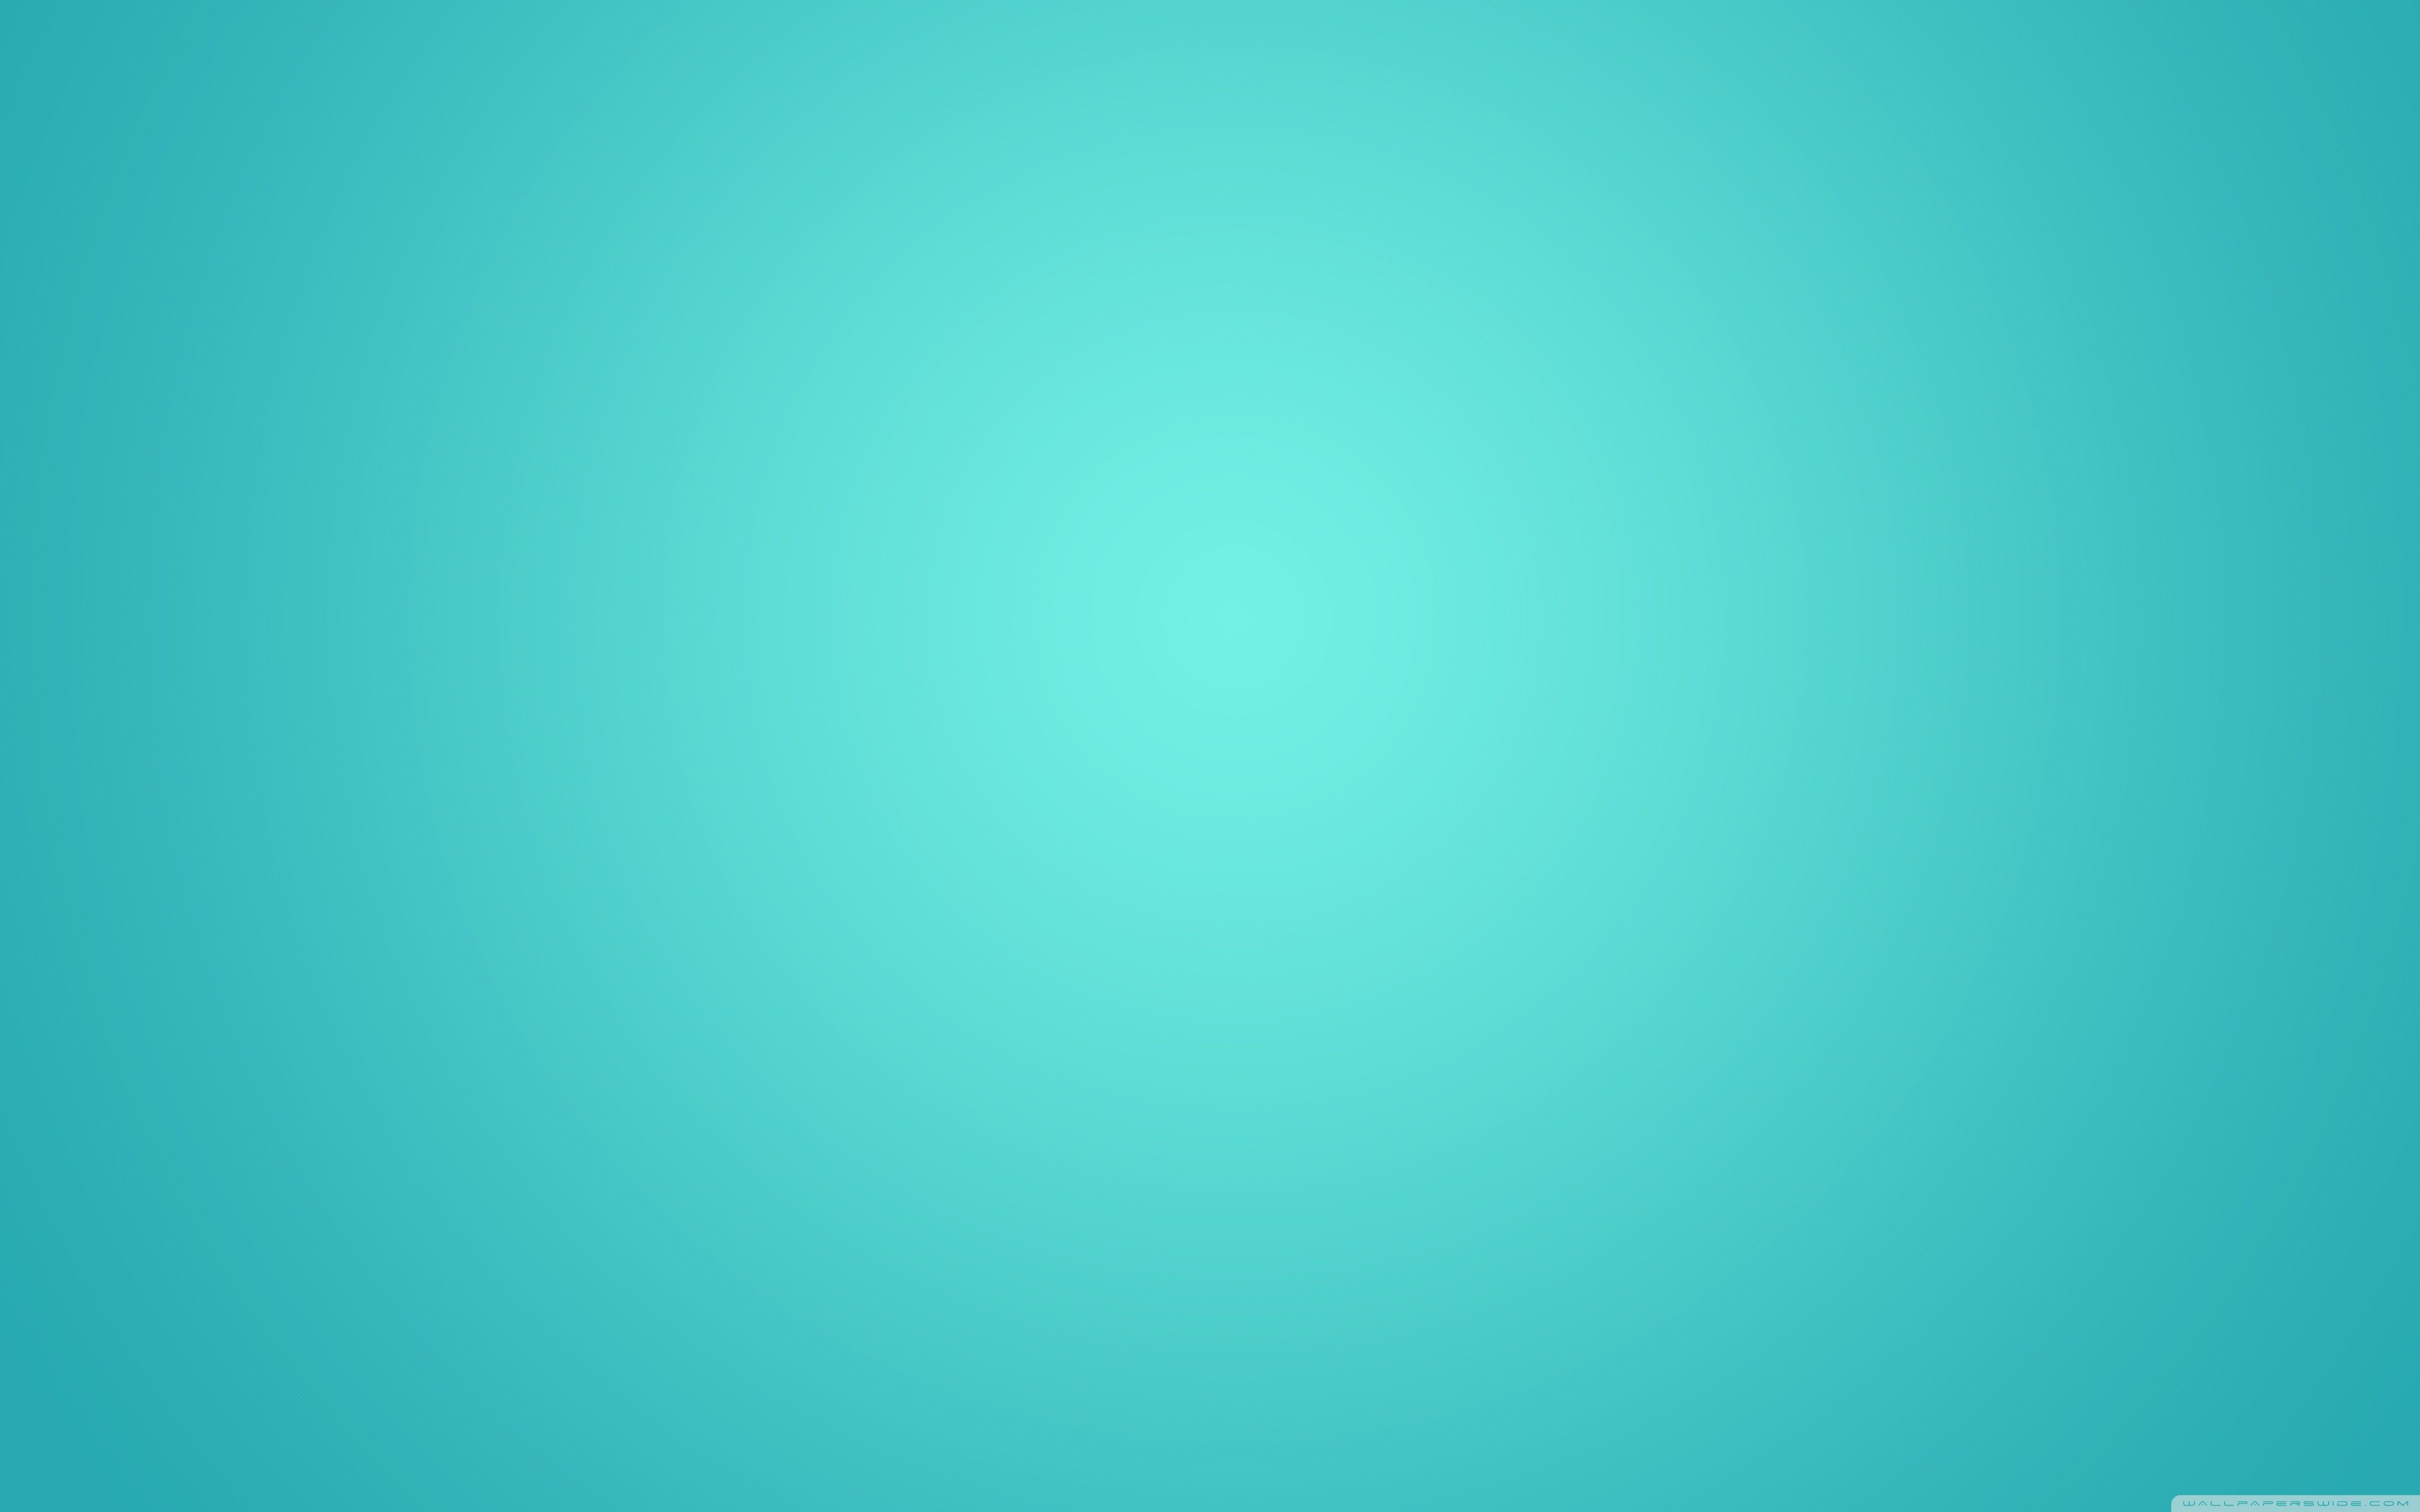 Cyan Blue Wallpaper